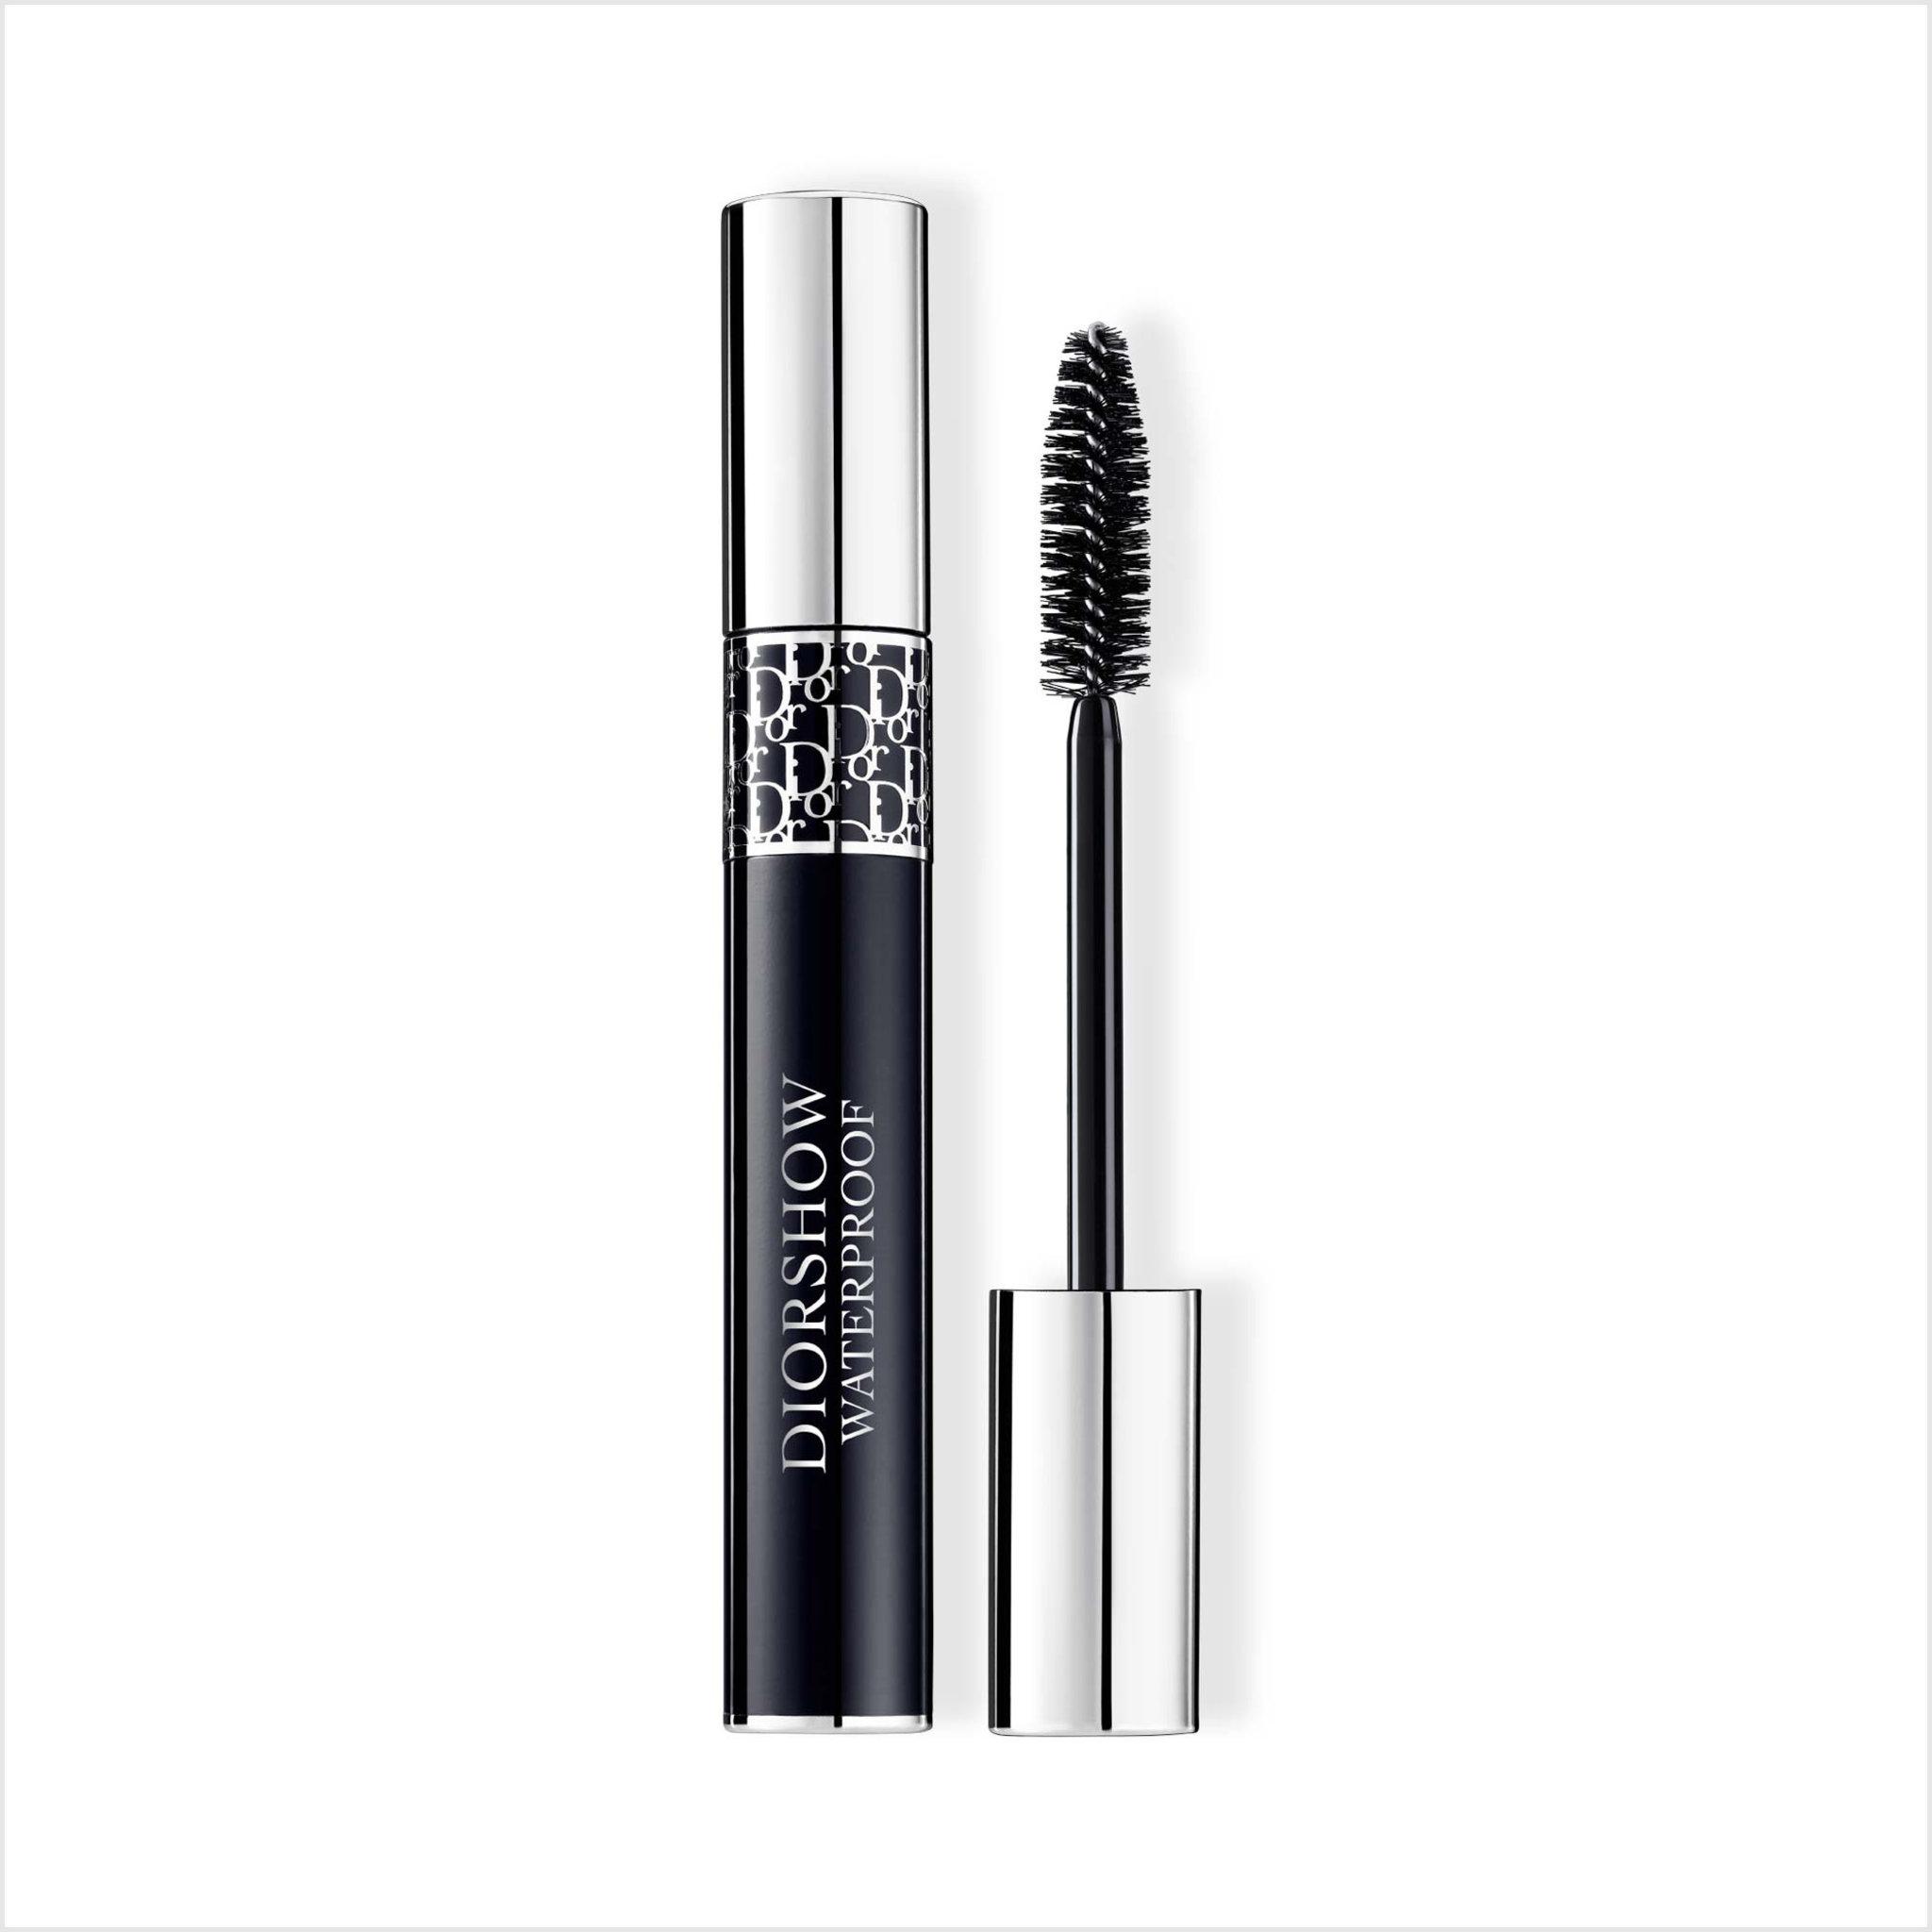 Diorshow Blackout Waterproof Mascara, 10 ML